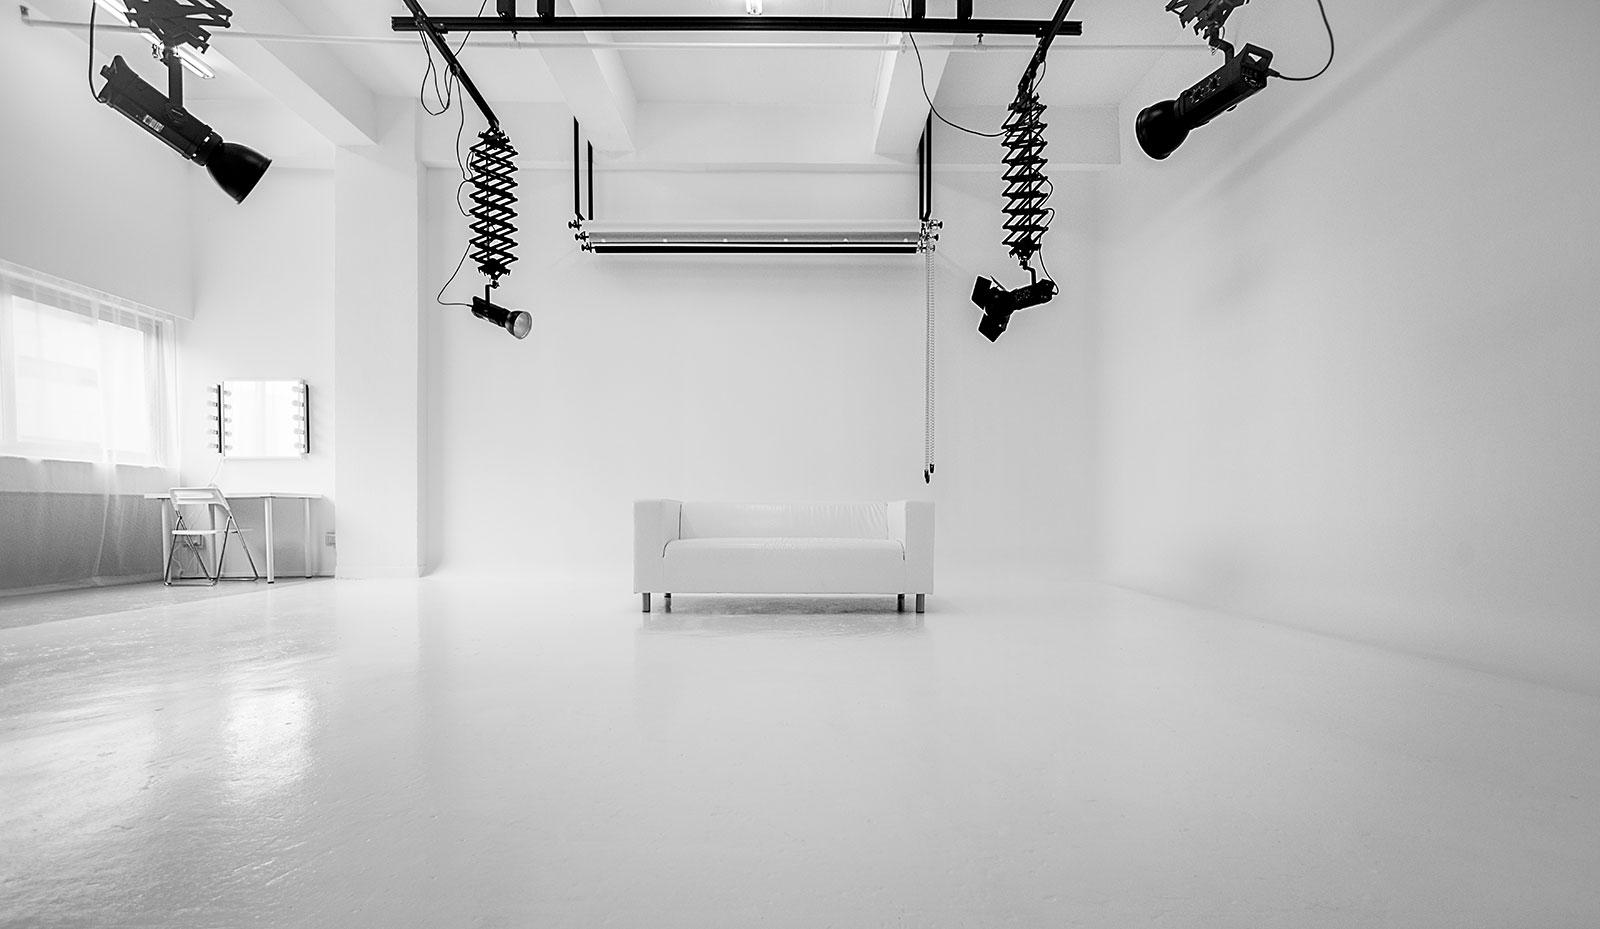 macpherson studio rental large white photo studio for rent in